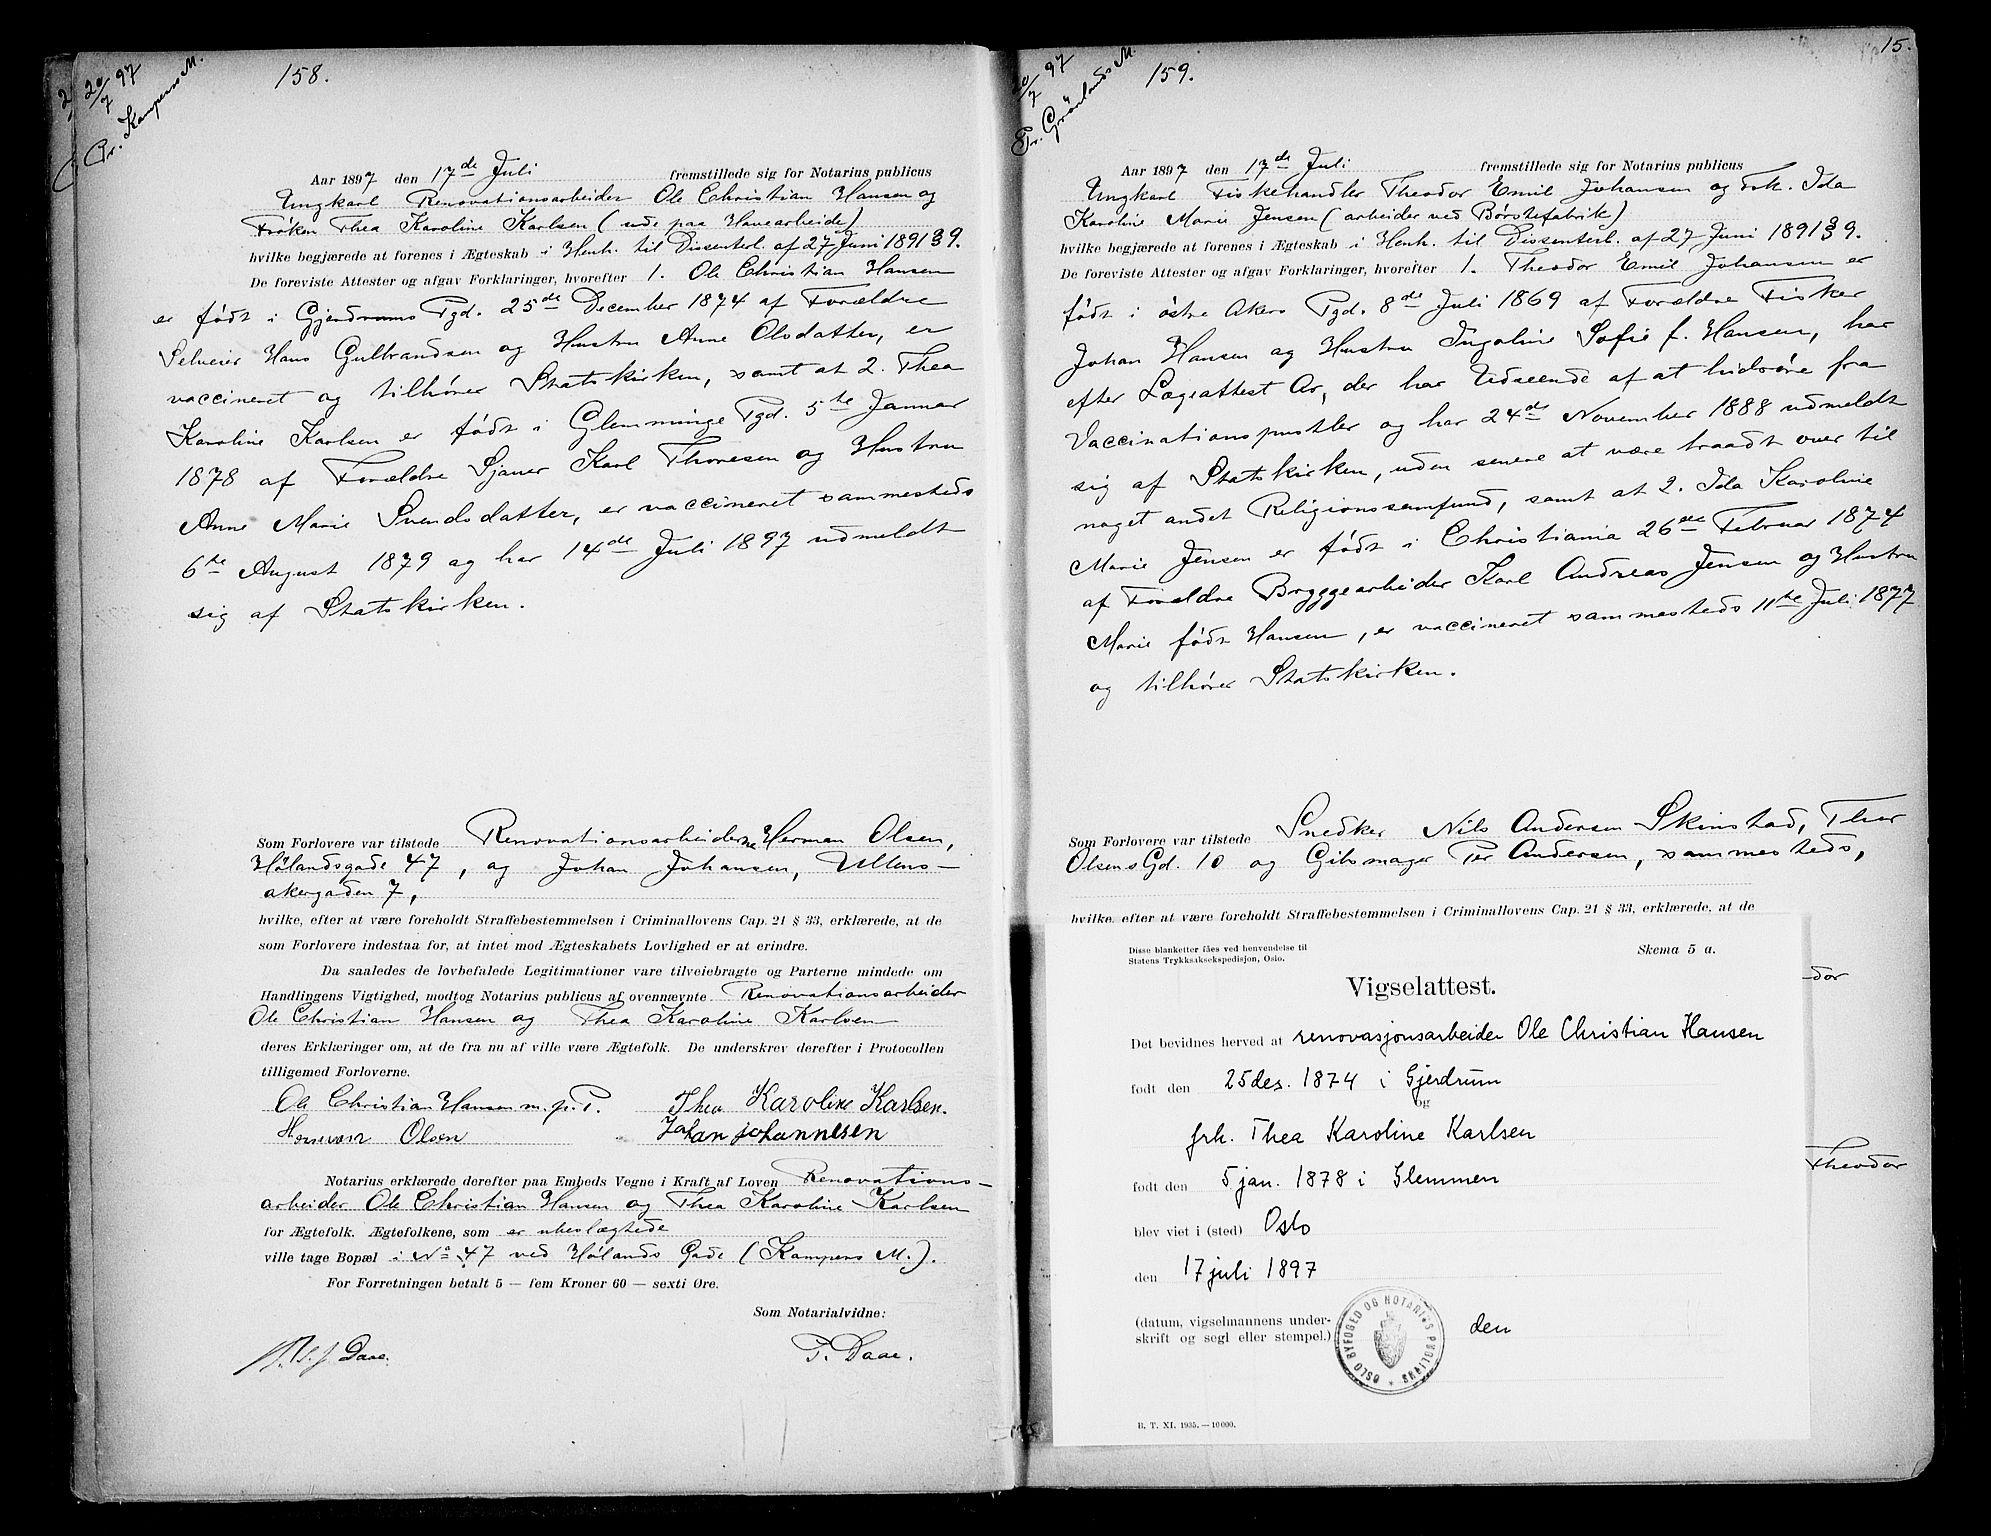 SAO, Oslo byfogd avd. I, L/Lb/Lbb/L0005: Notarialprotokoll, rekke II: Vigsler, 1897-1902, s. 14b-15a